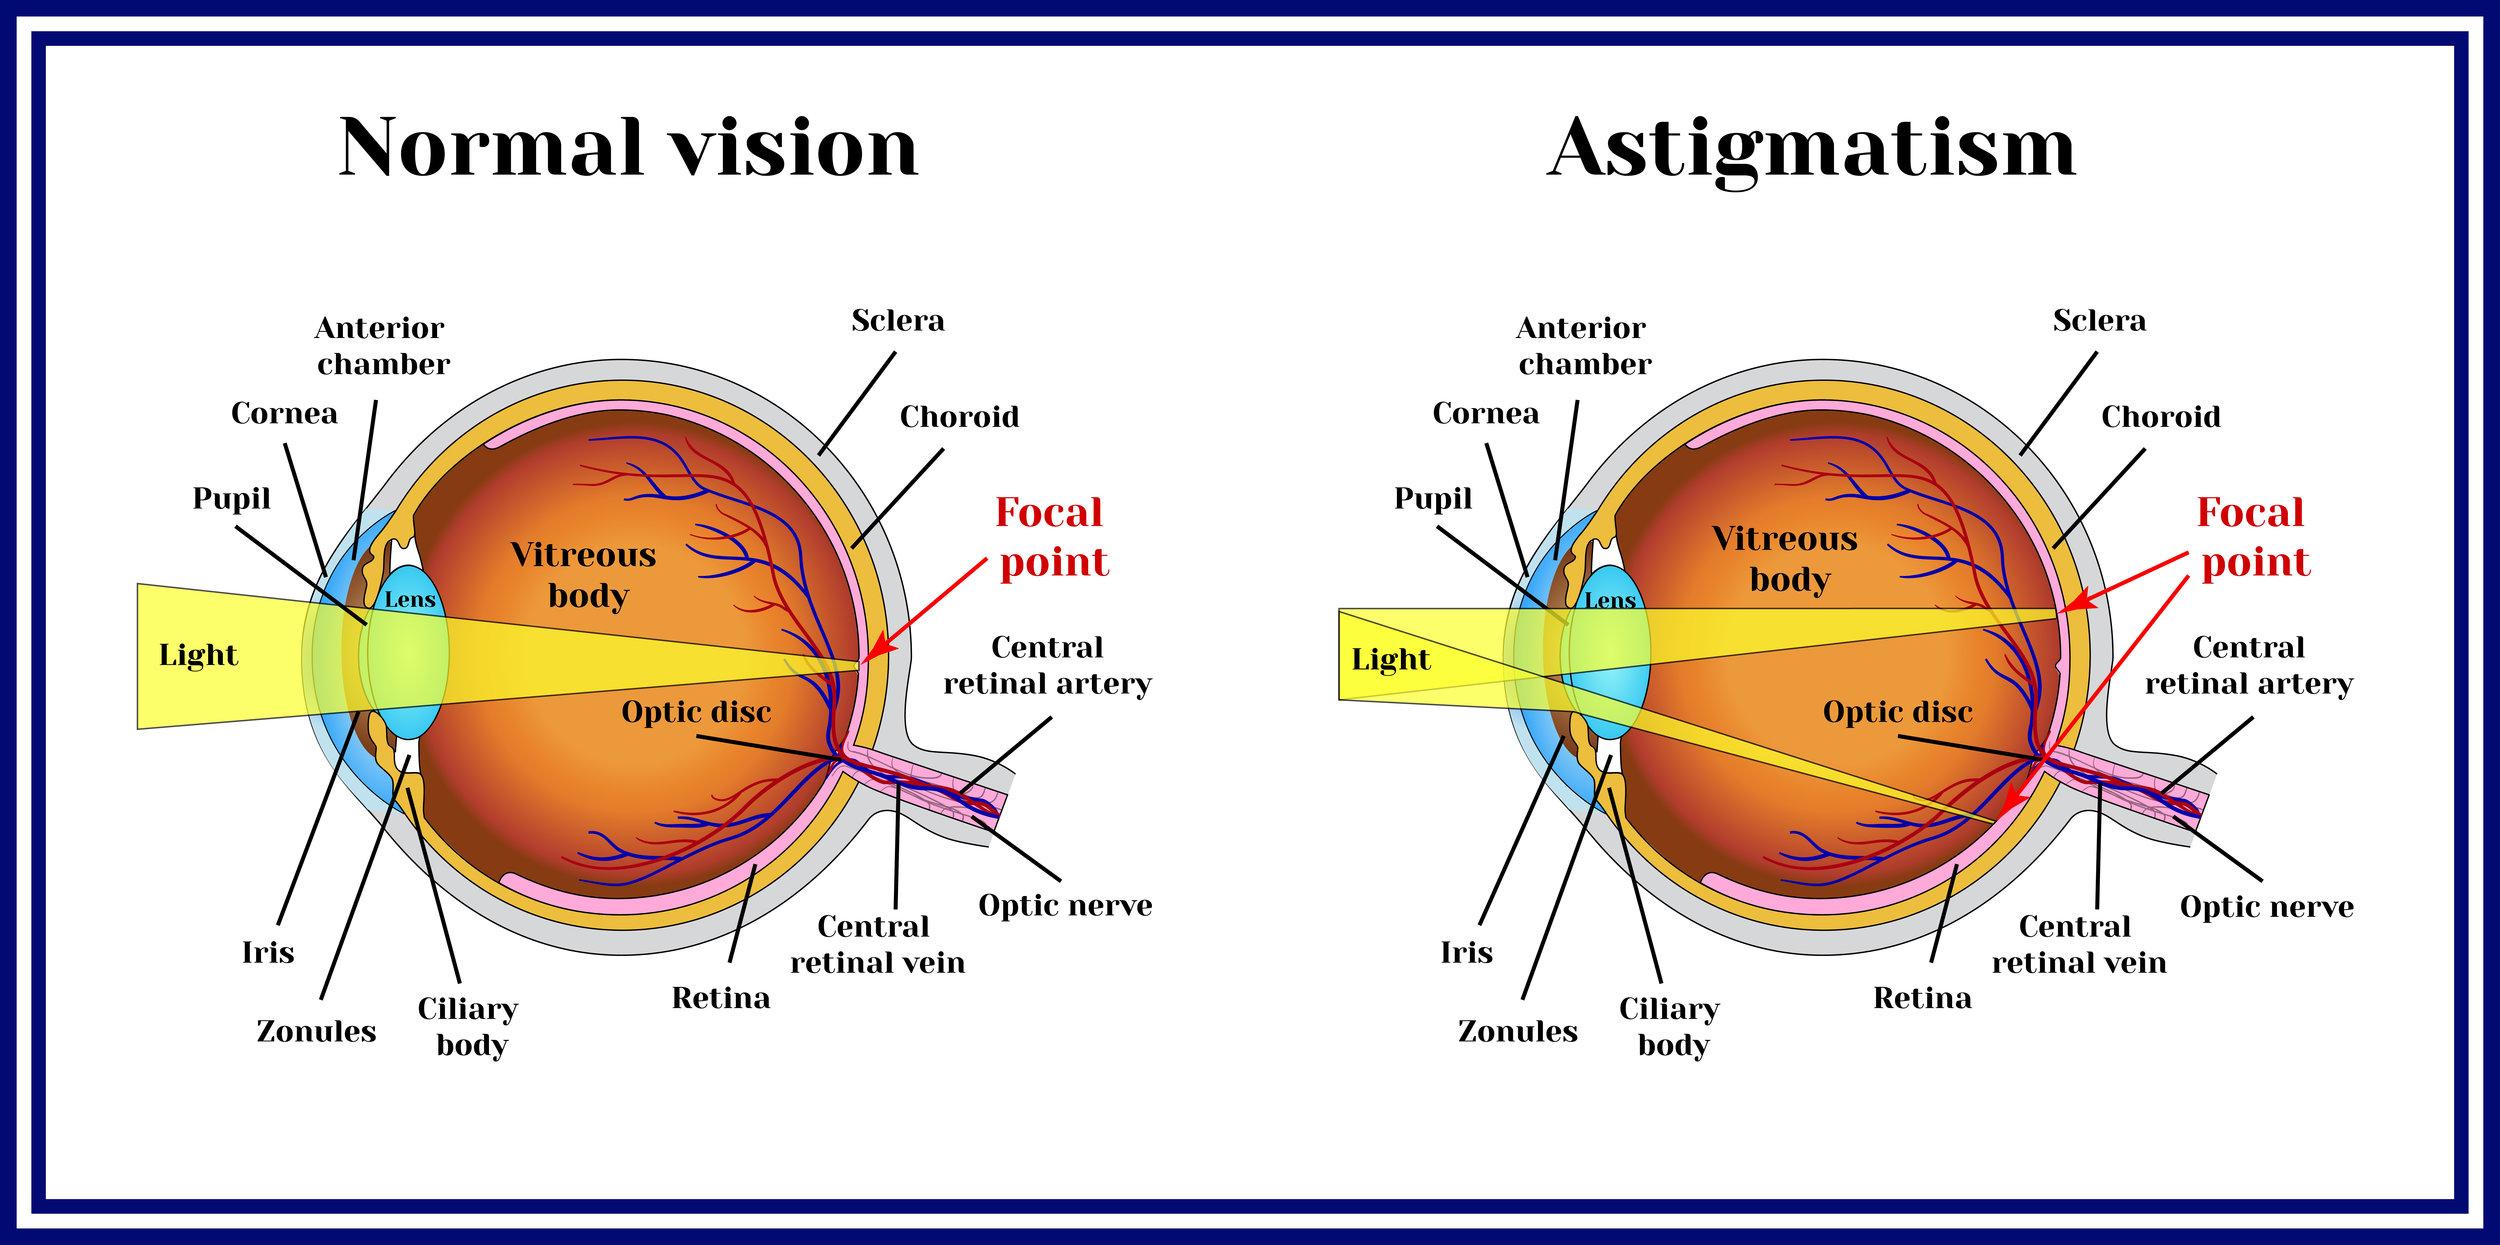 Magruder-Laser-Vision-Astigmatism.jpg